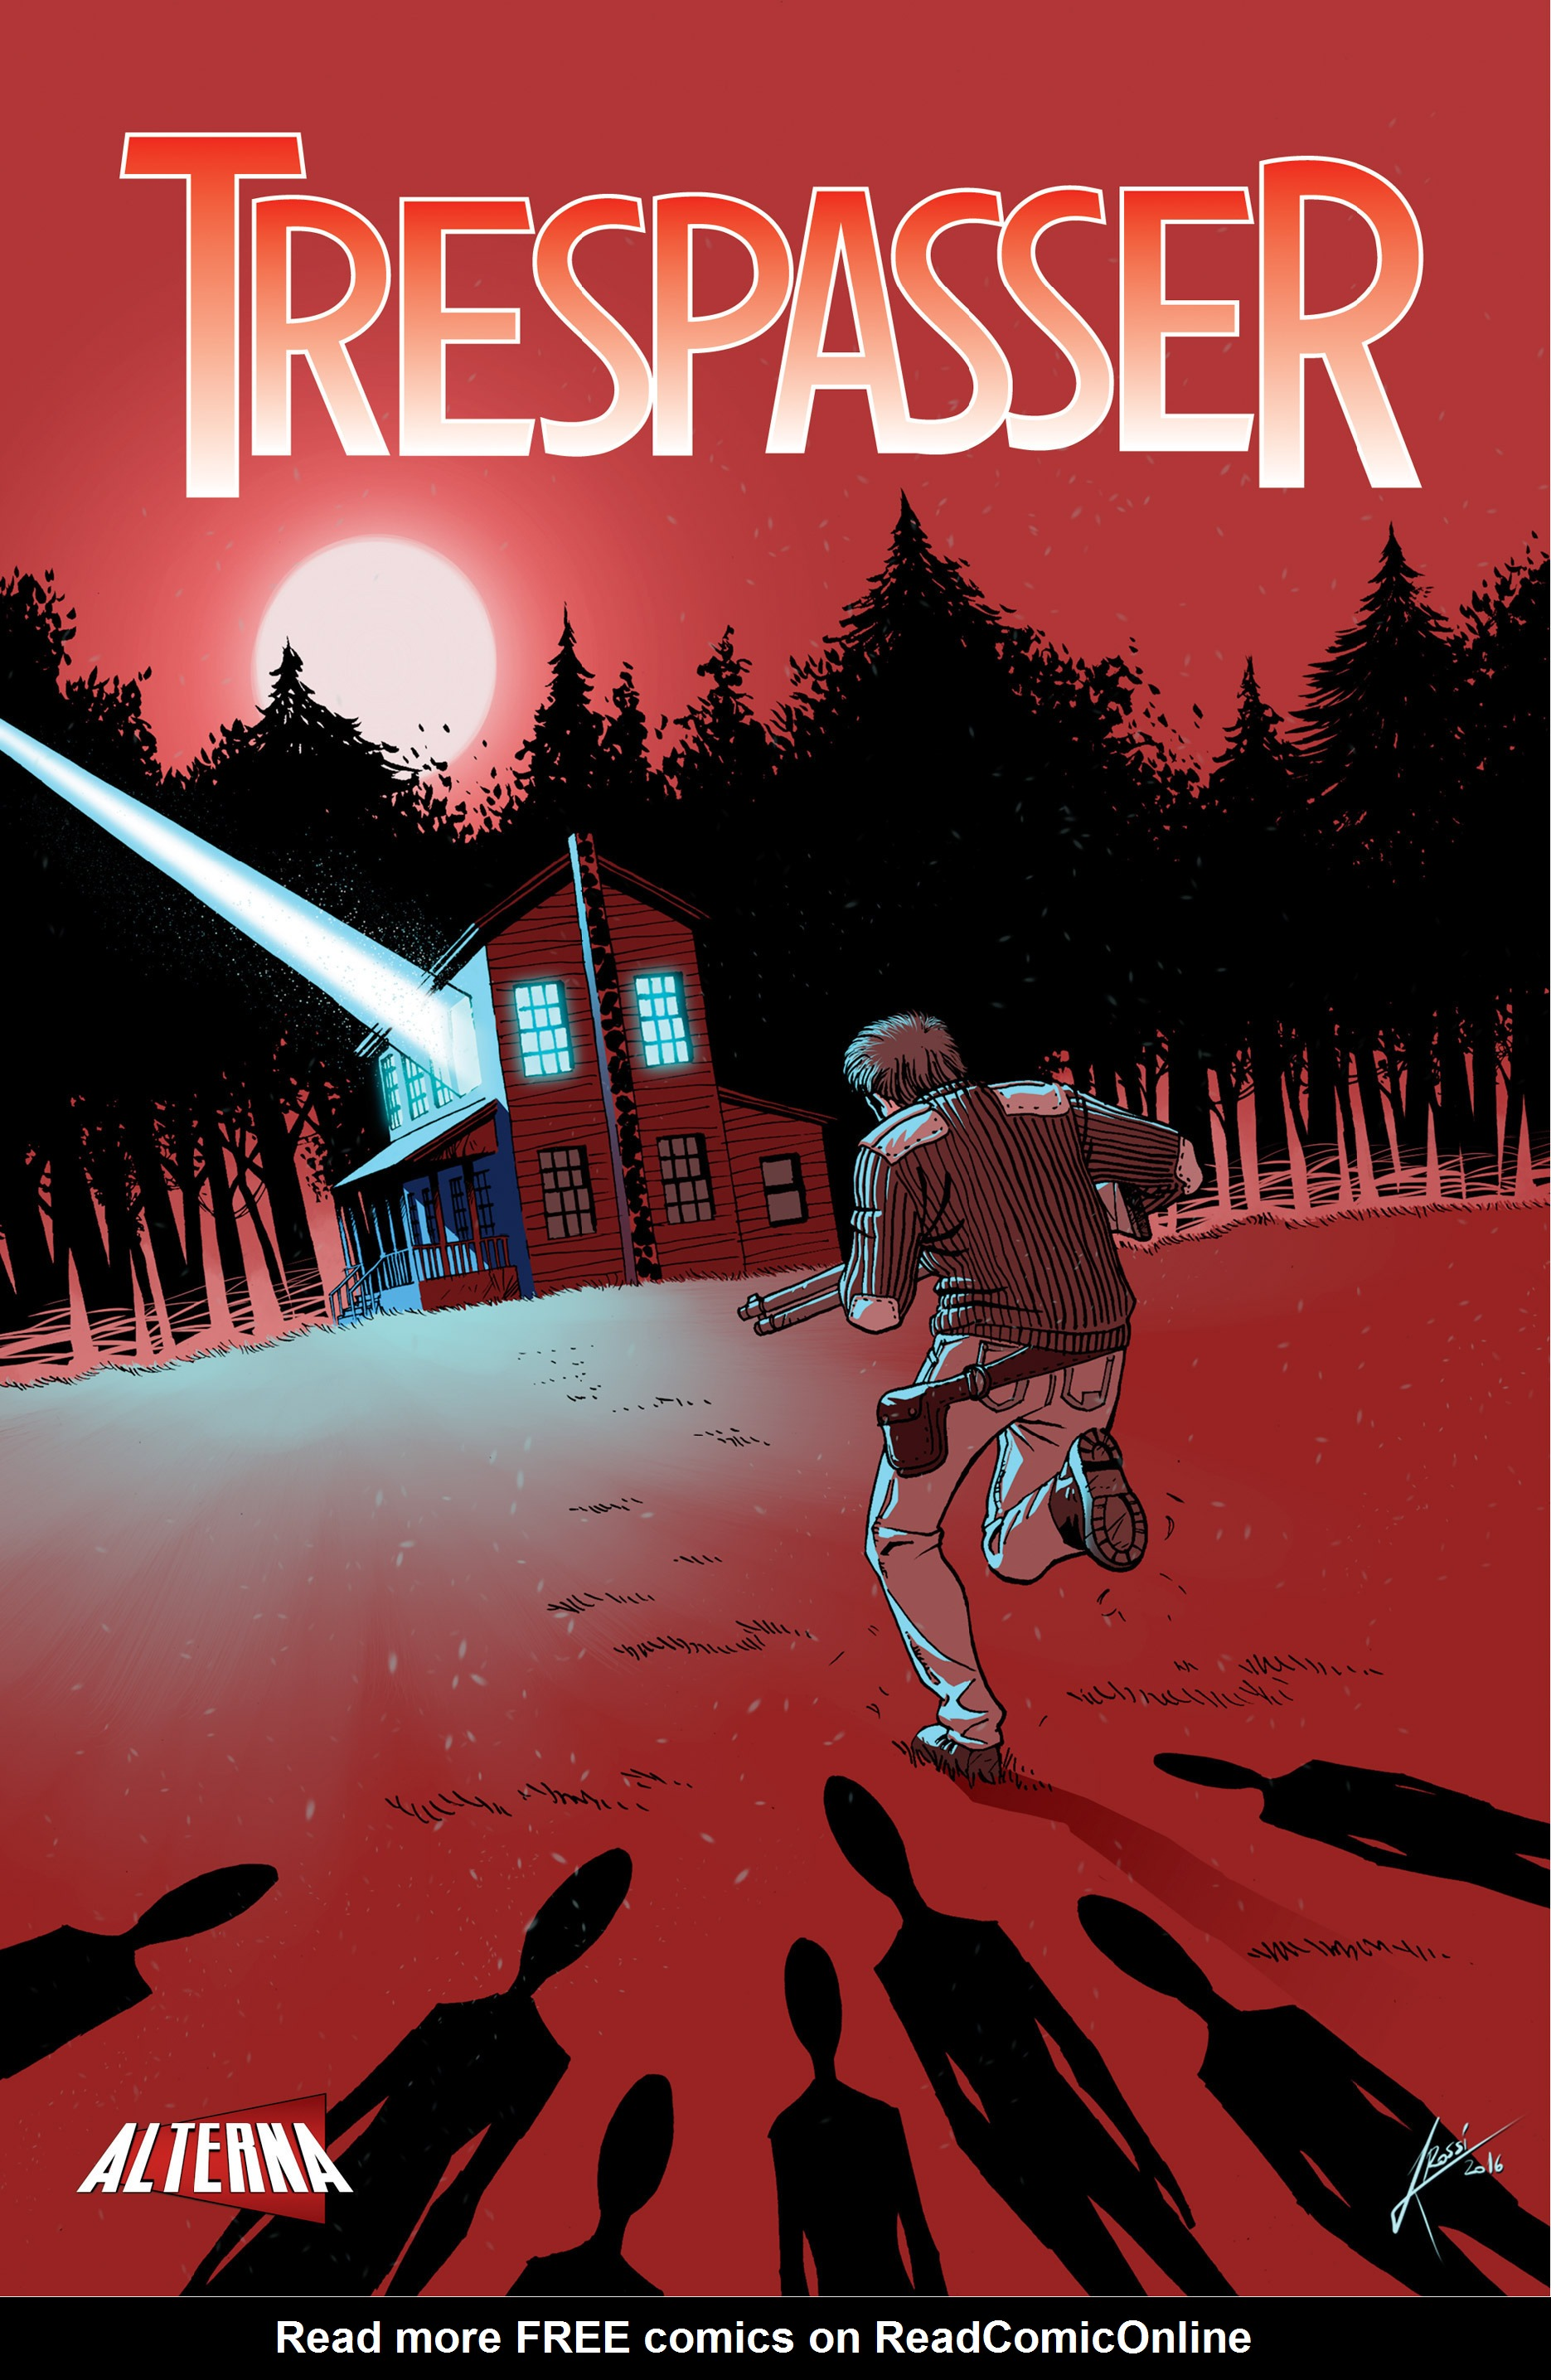 Read online Trespasser comic -  Issue #4 - 1